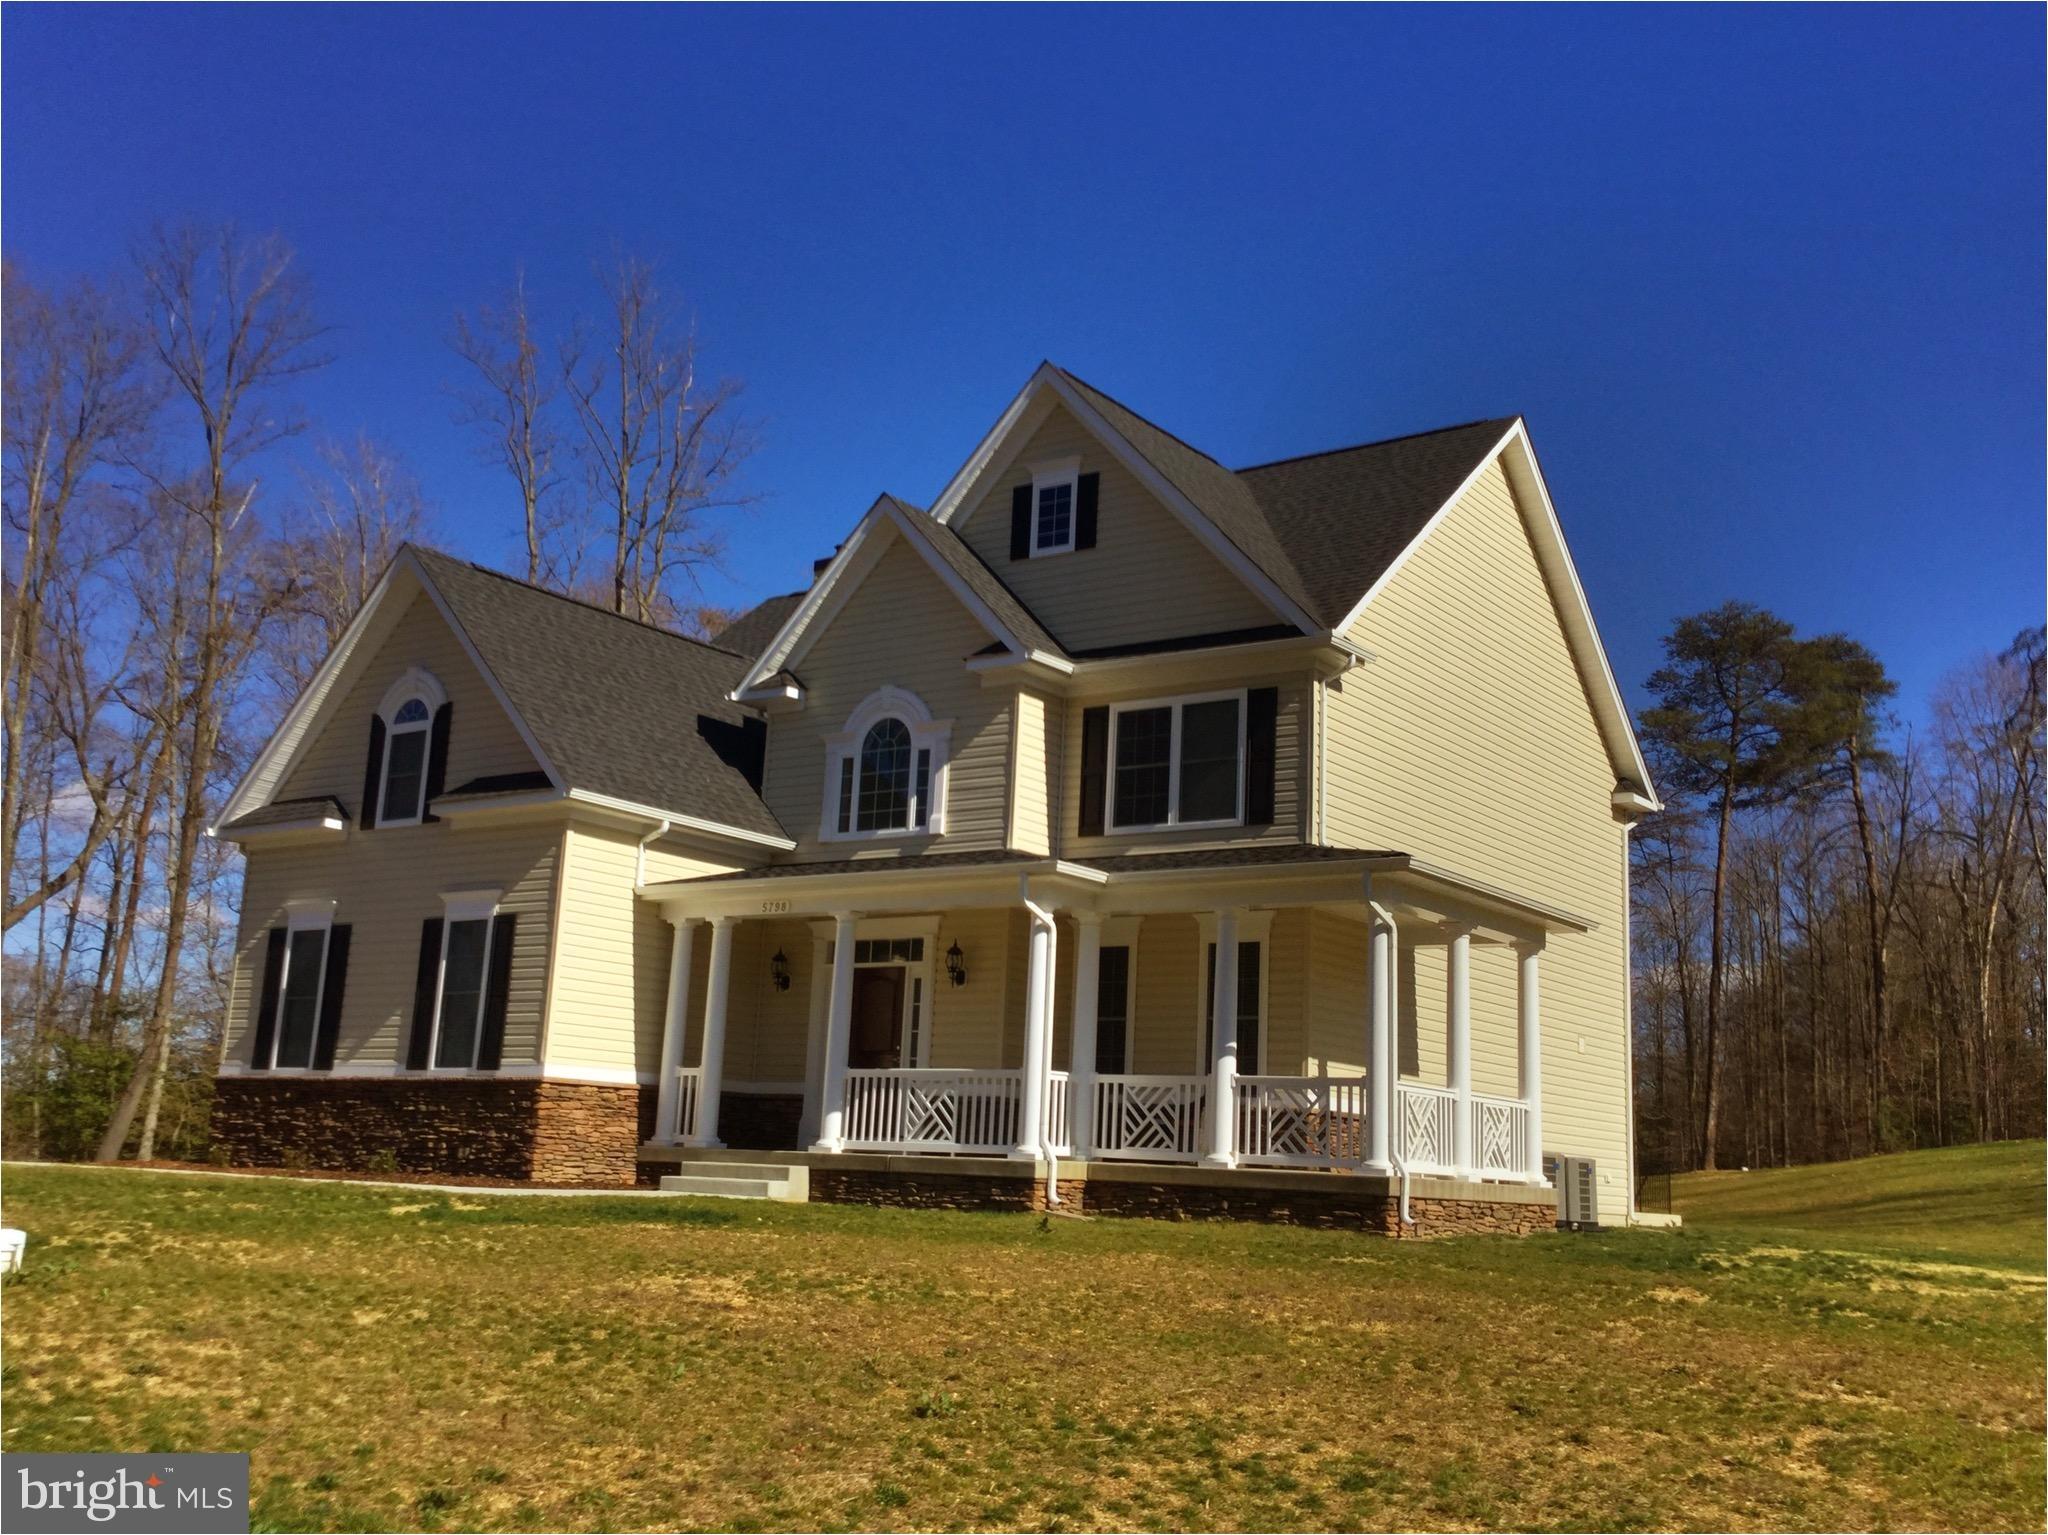 similar properties to 7235 jockey court hughesville md 20637